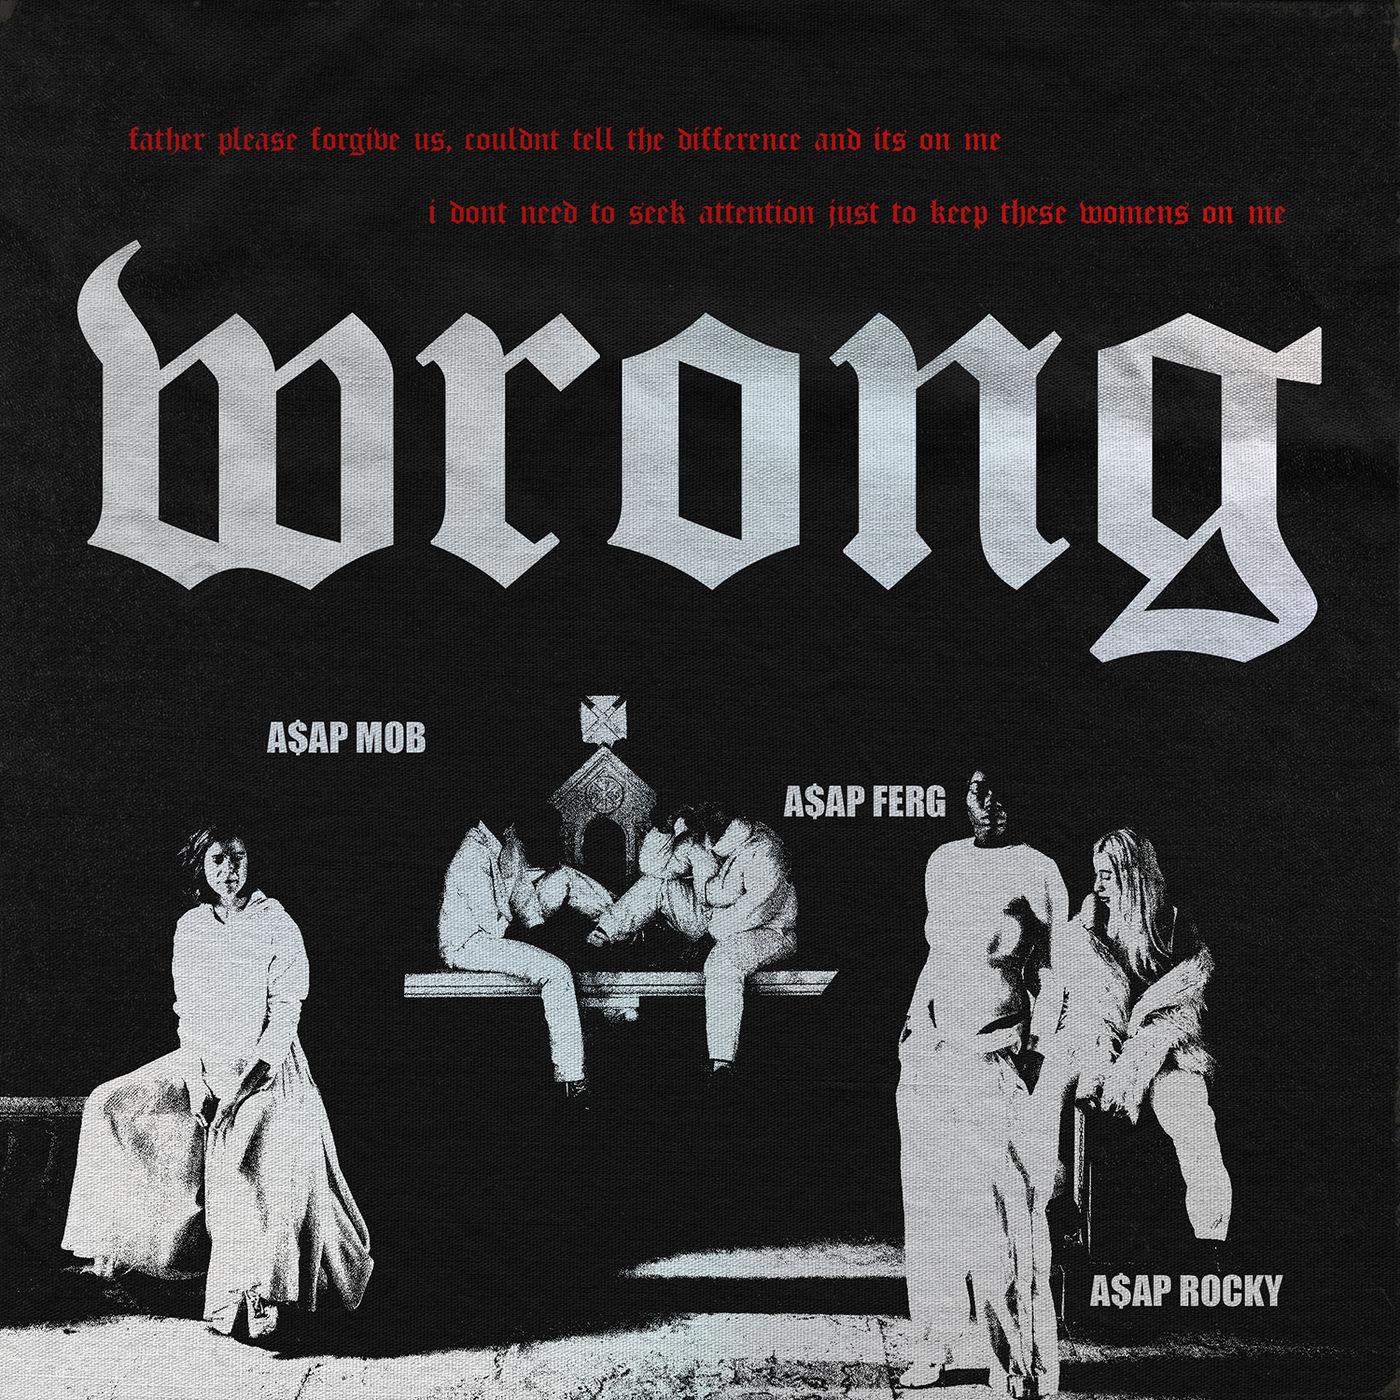 A$AP Mob - Wrong (feat. A$AP Rocky & A$AP Ferg) - Single Cover